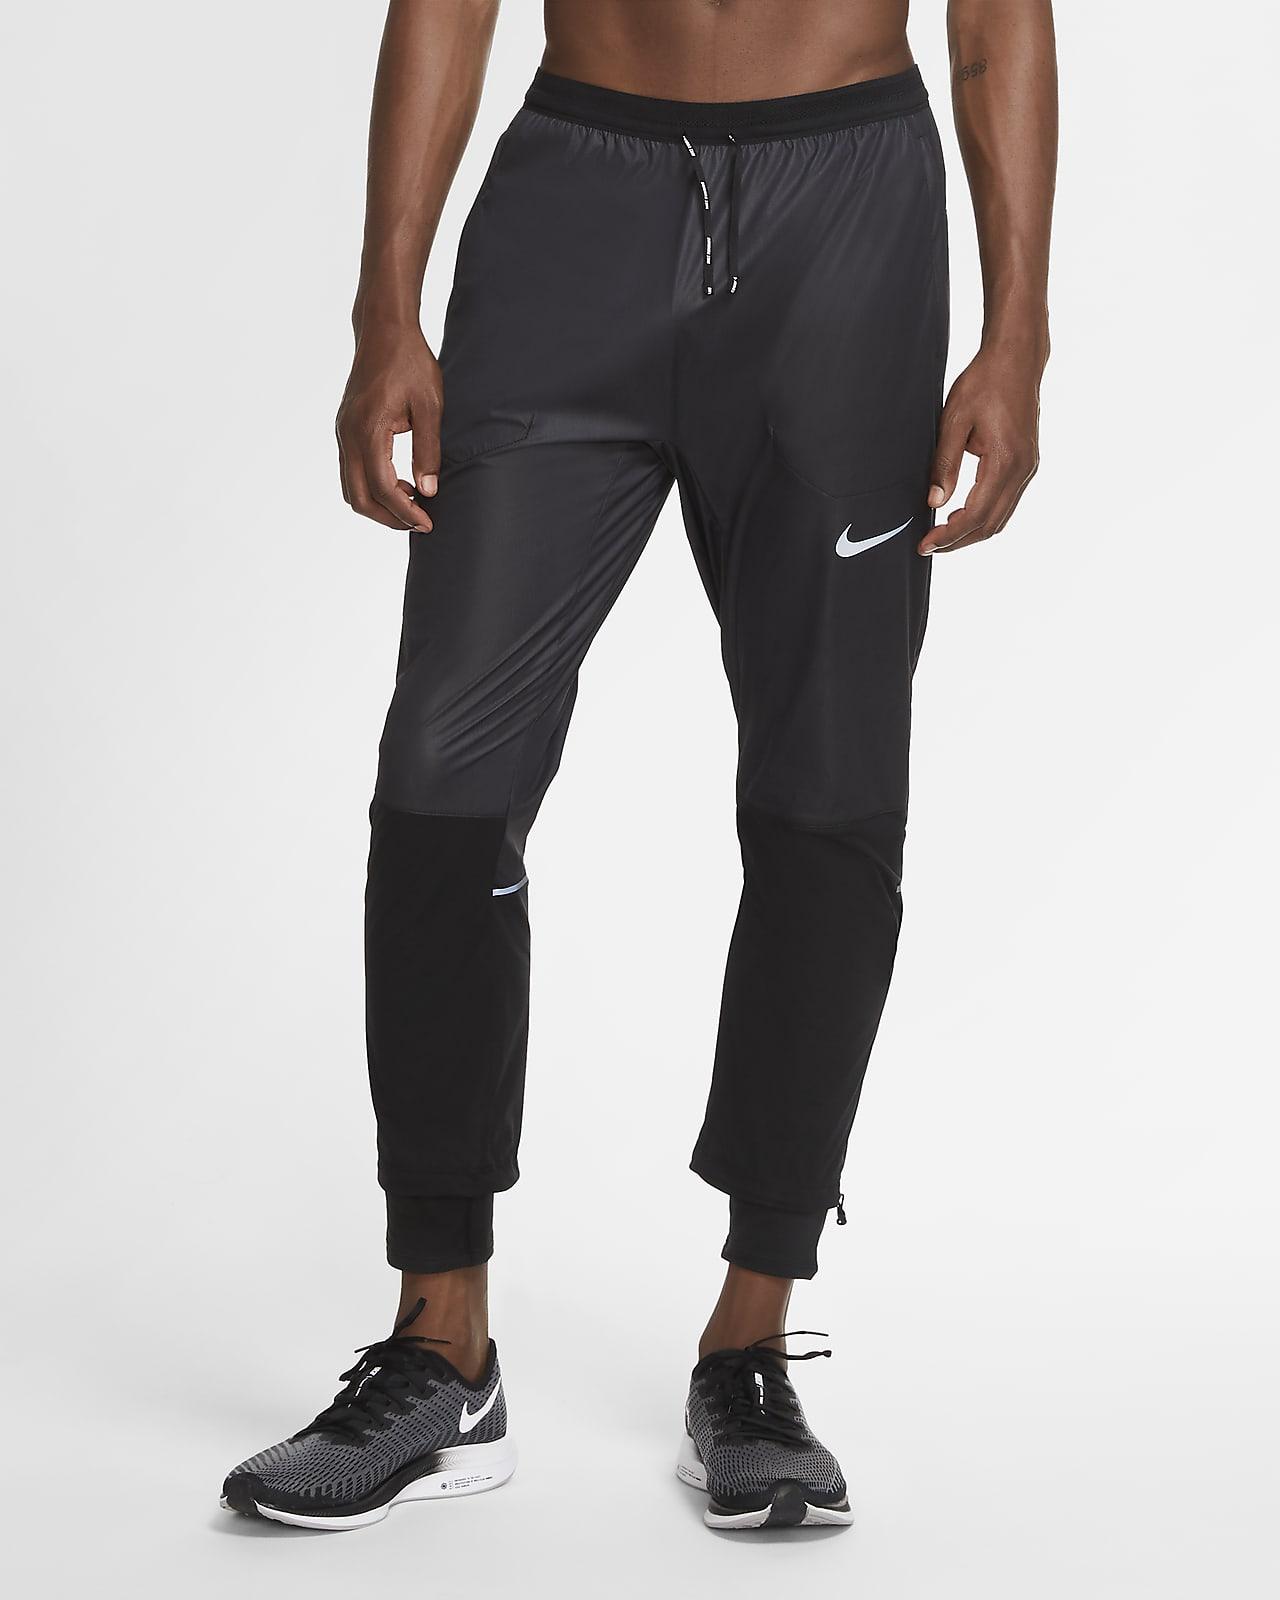 Nike Swift Shield Herren-Laufhose